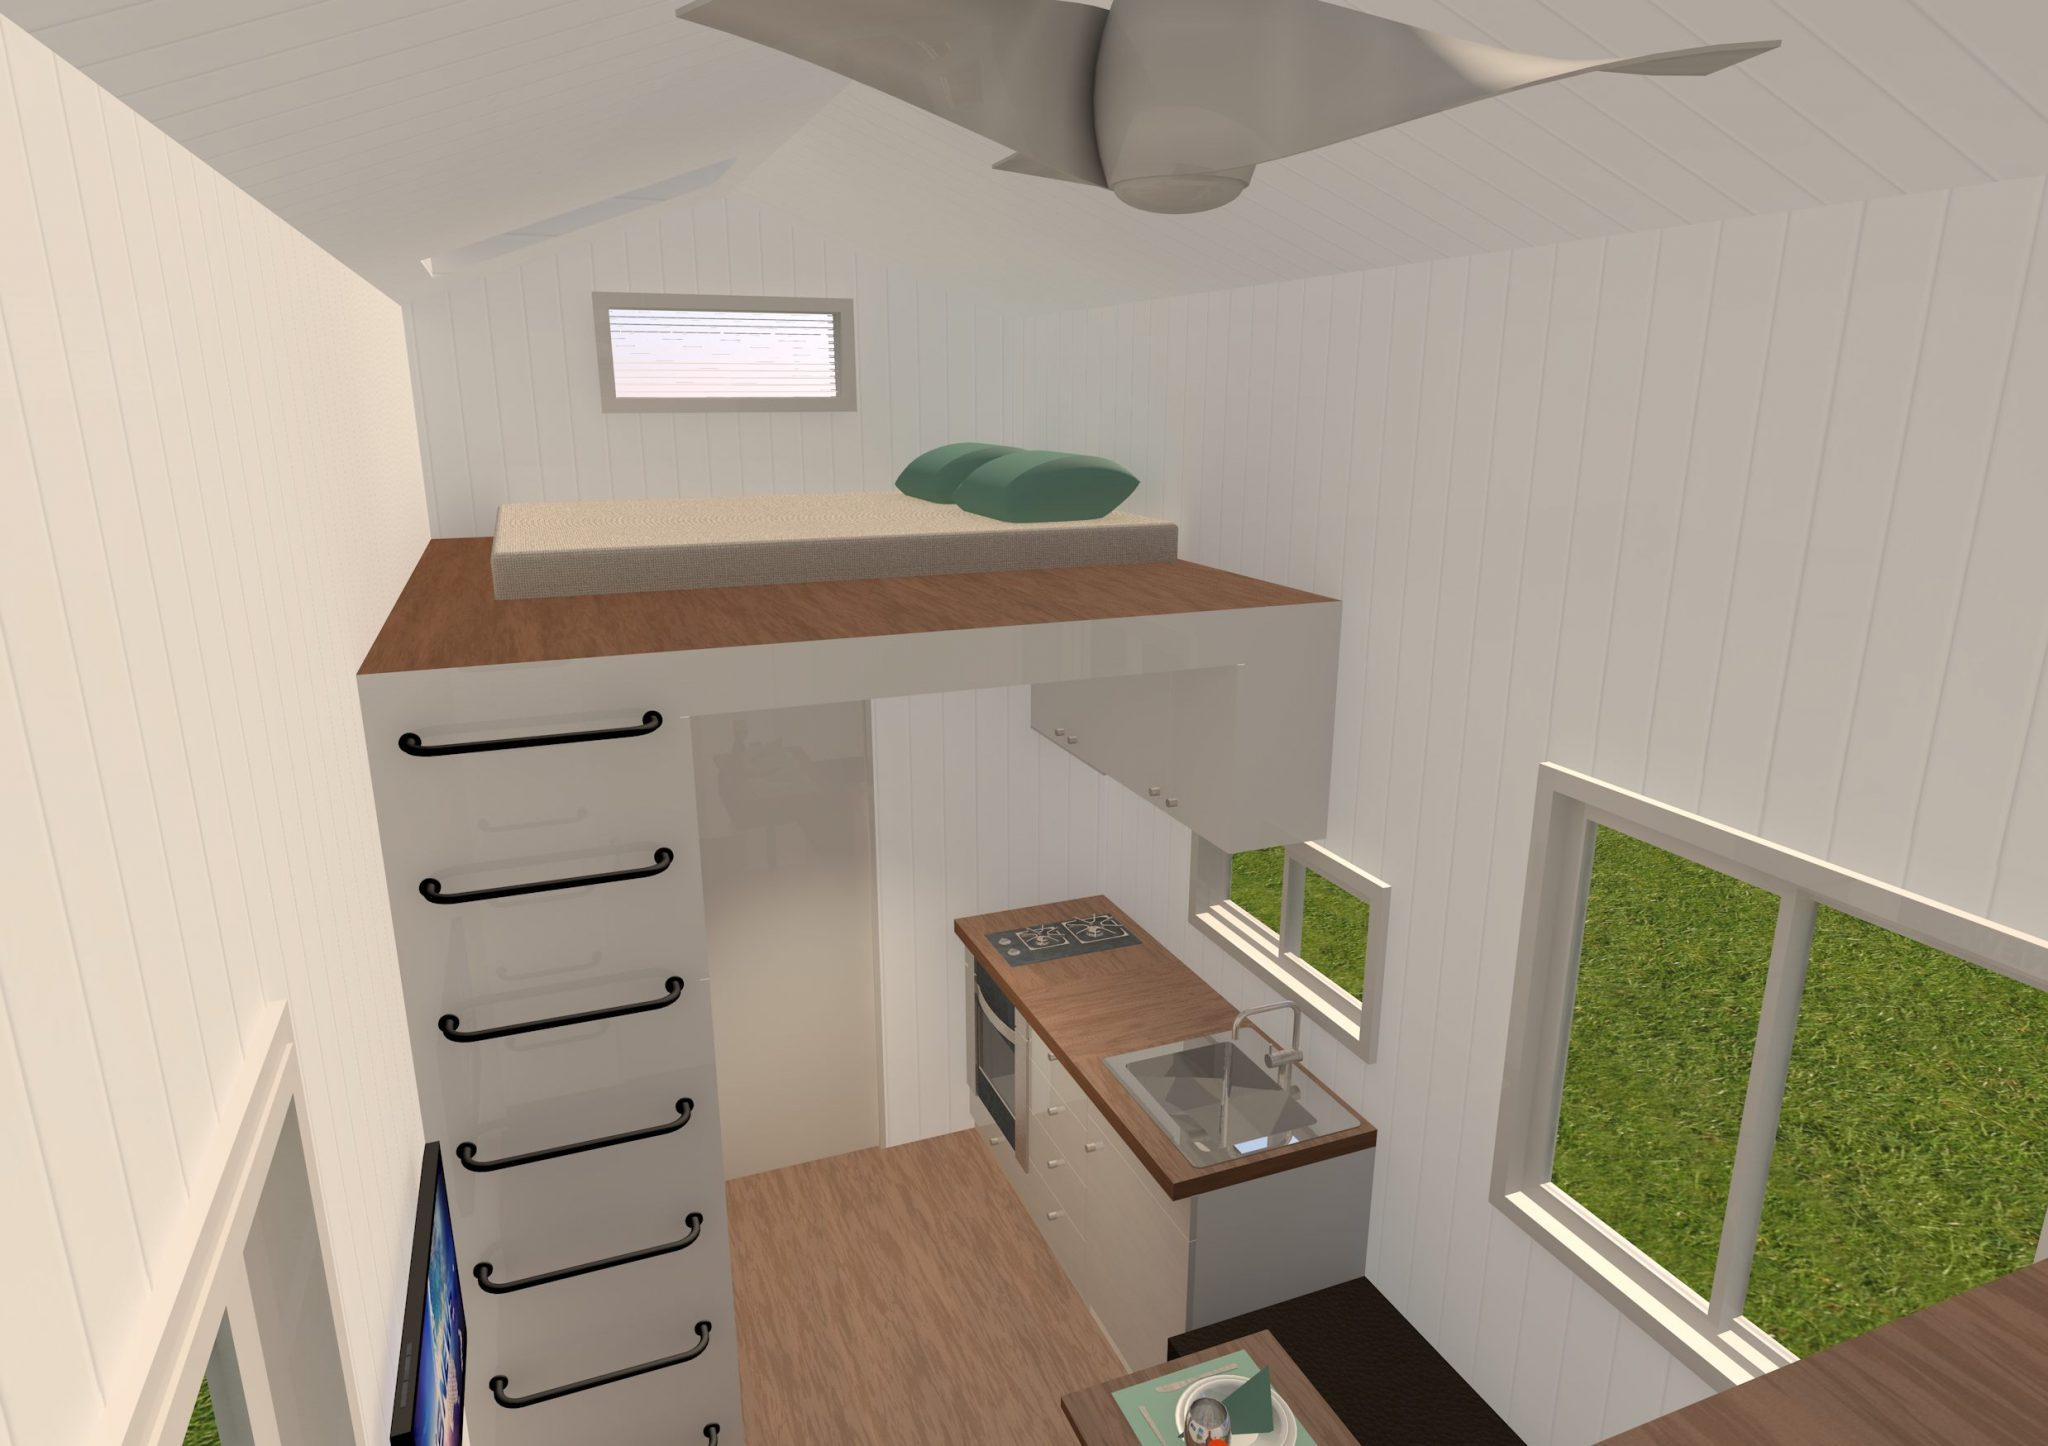 Lifestyle Series 7200GB Interior kitchen